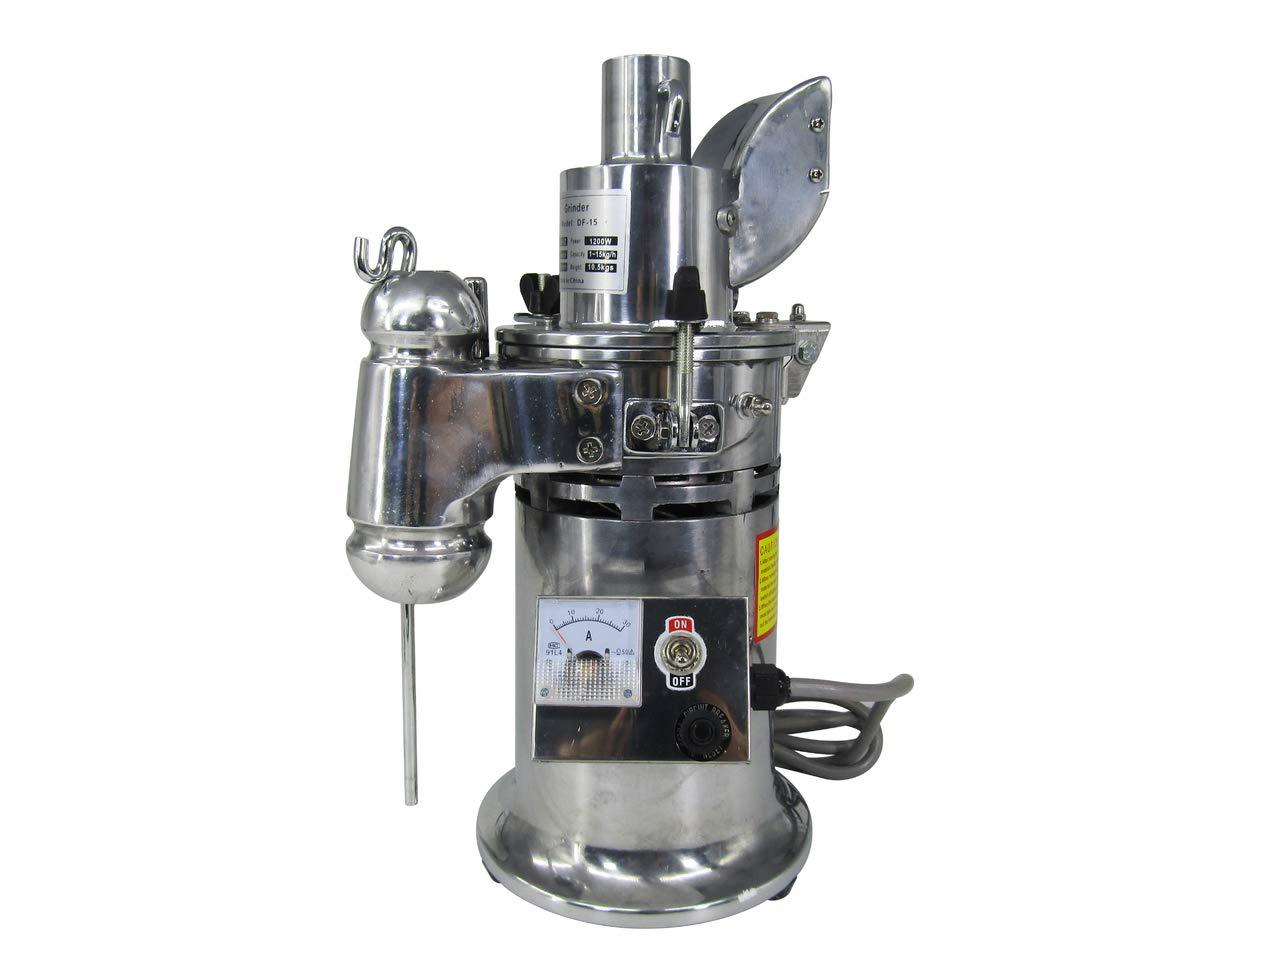 JIAWANSHUN Commercial Grain Grinder Automatic Mill Herb Grinder Medicial Powder Grinding Machine 15kg (220V)